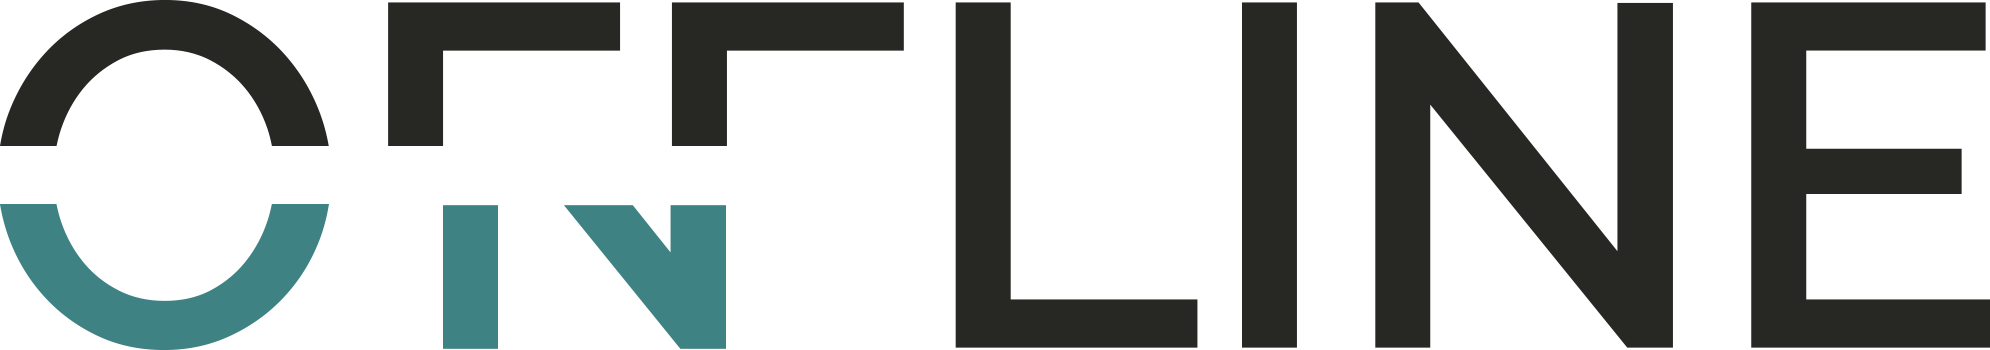 Documentation | OFFLINE Agency